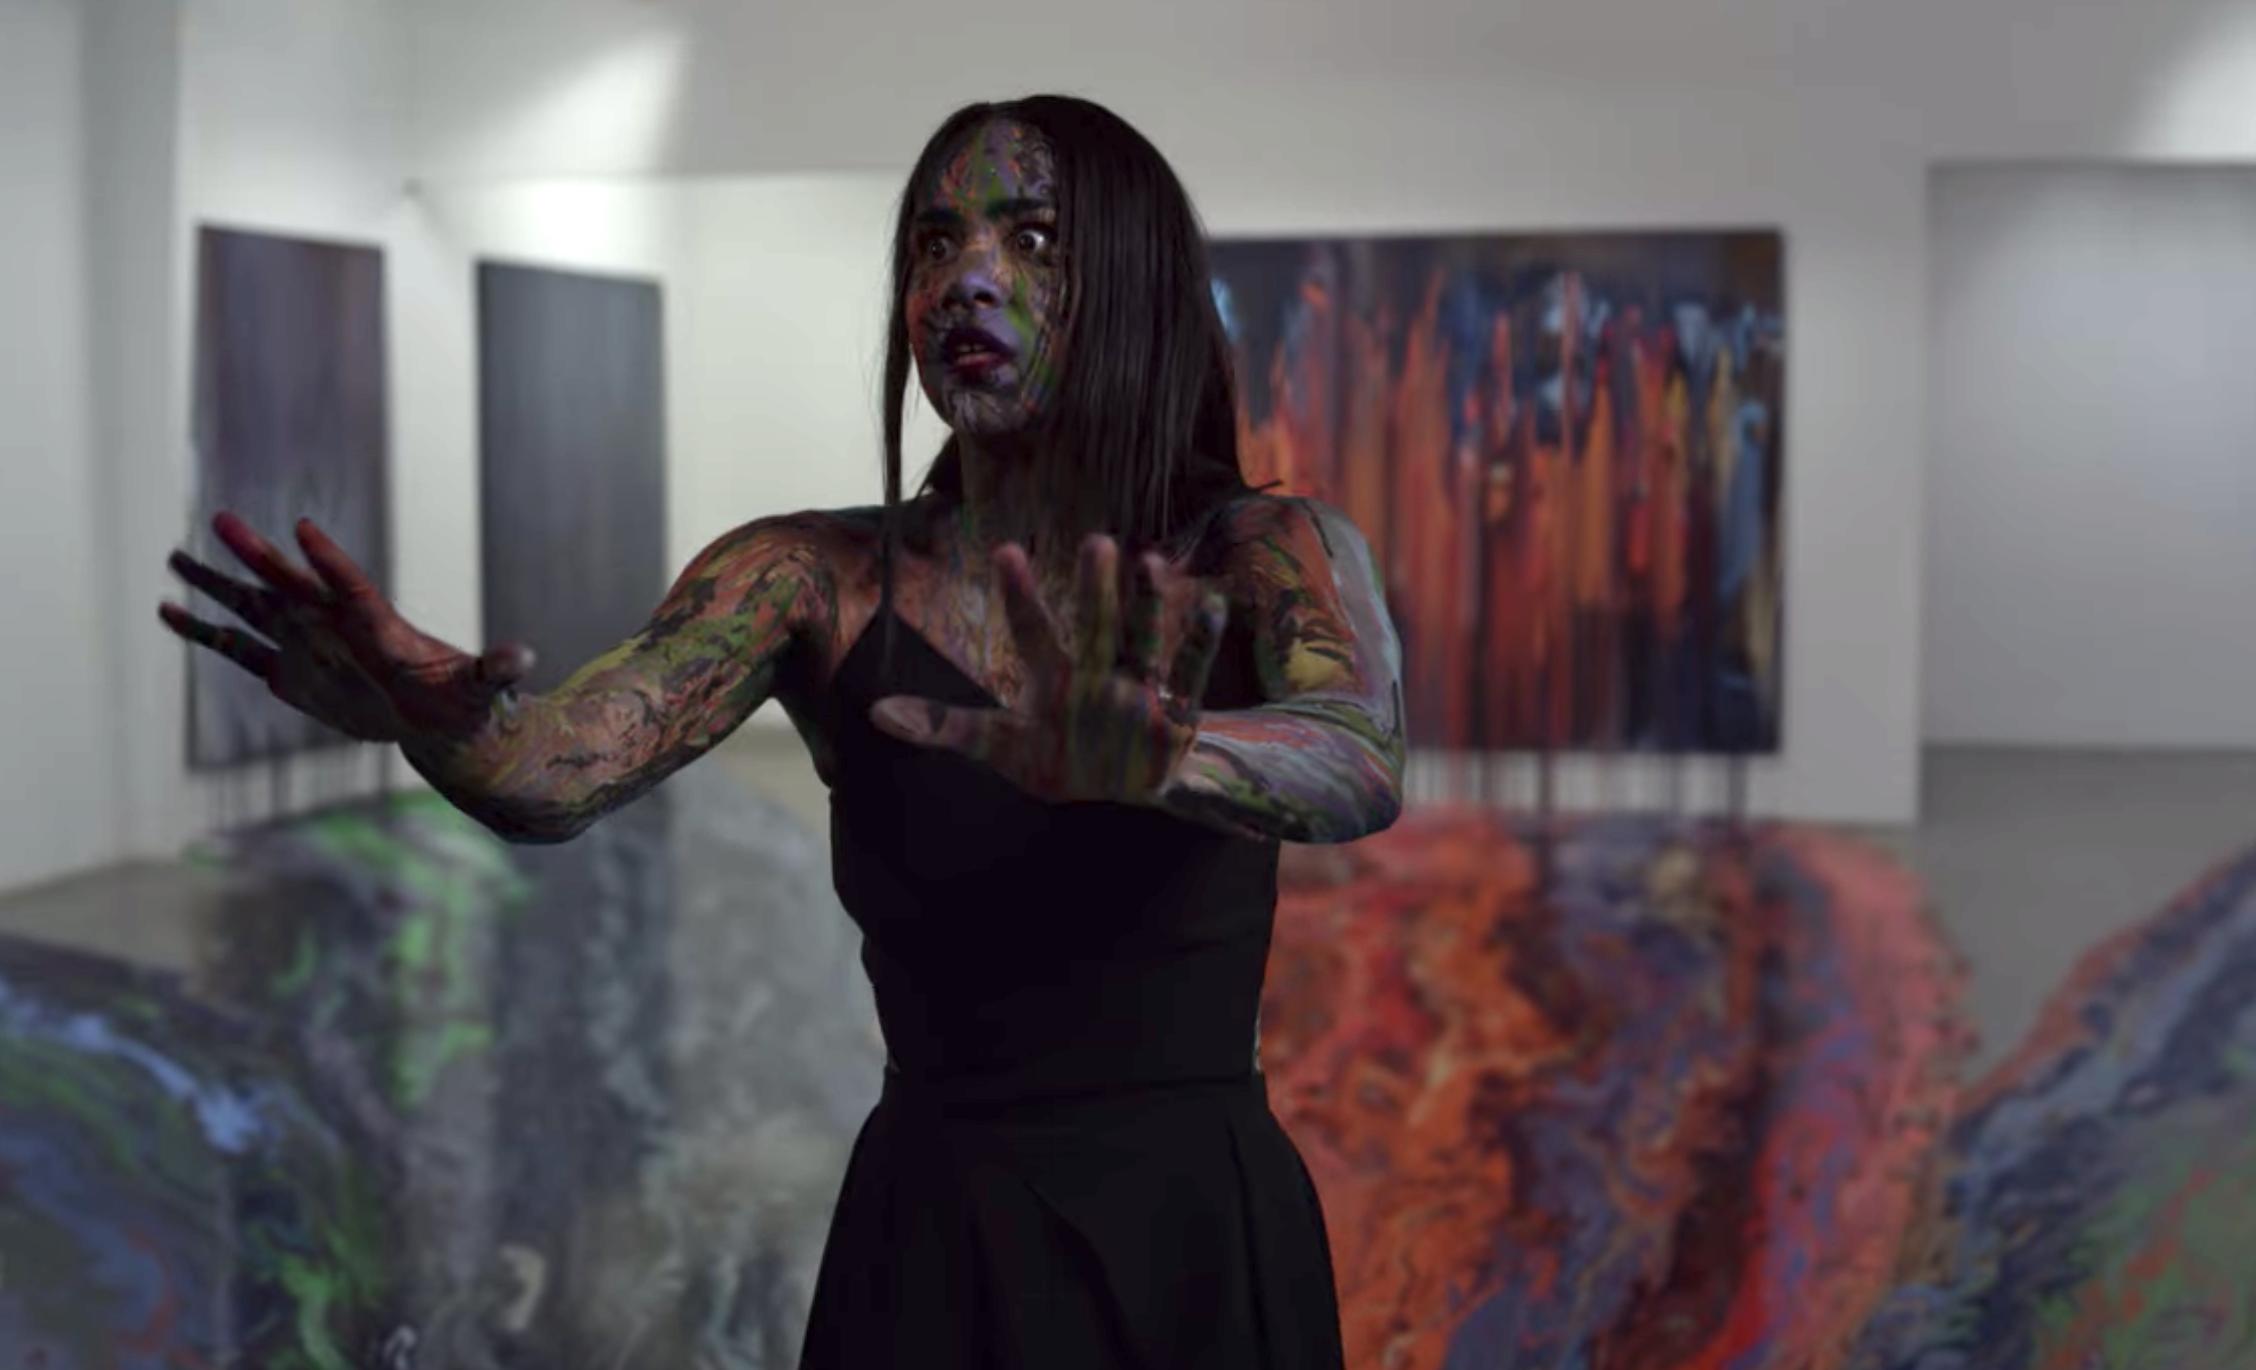 Josephina panicking as the paintings melt on her